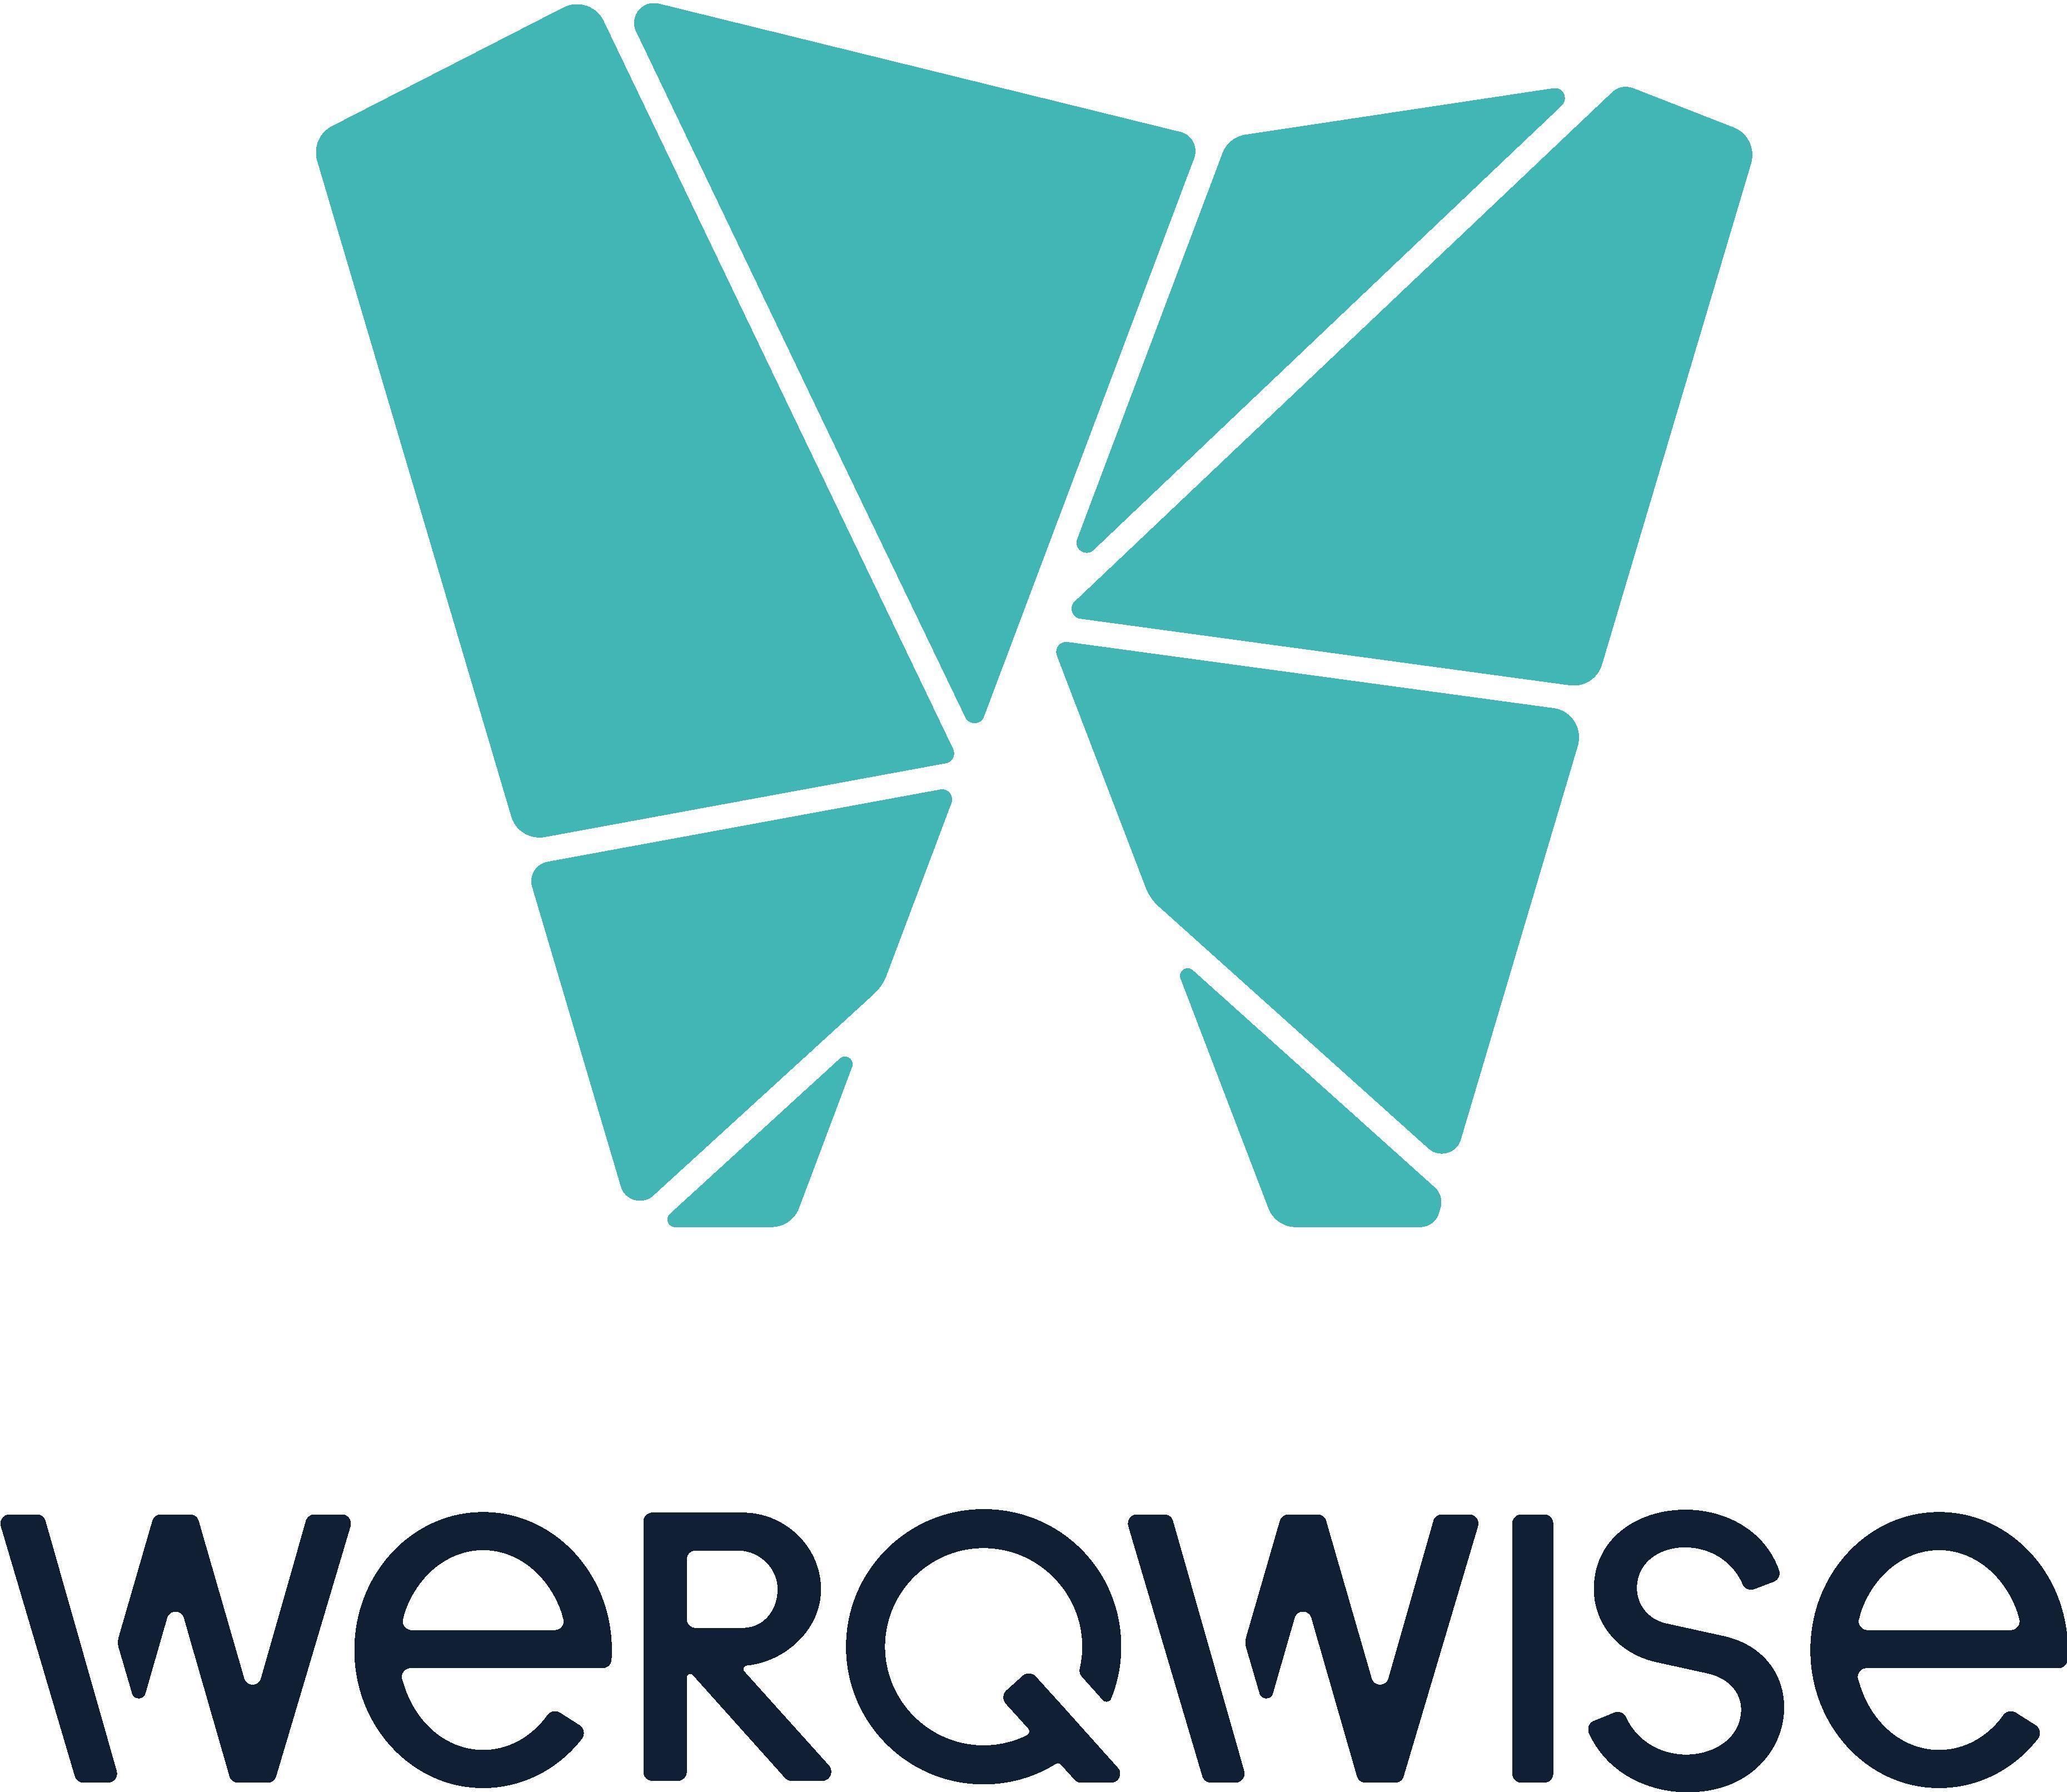 Logo of Werqwise